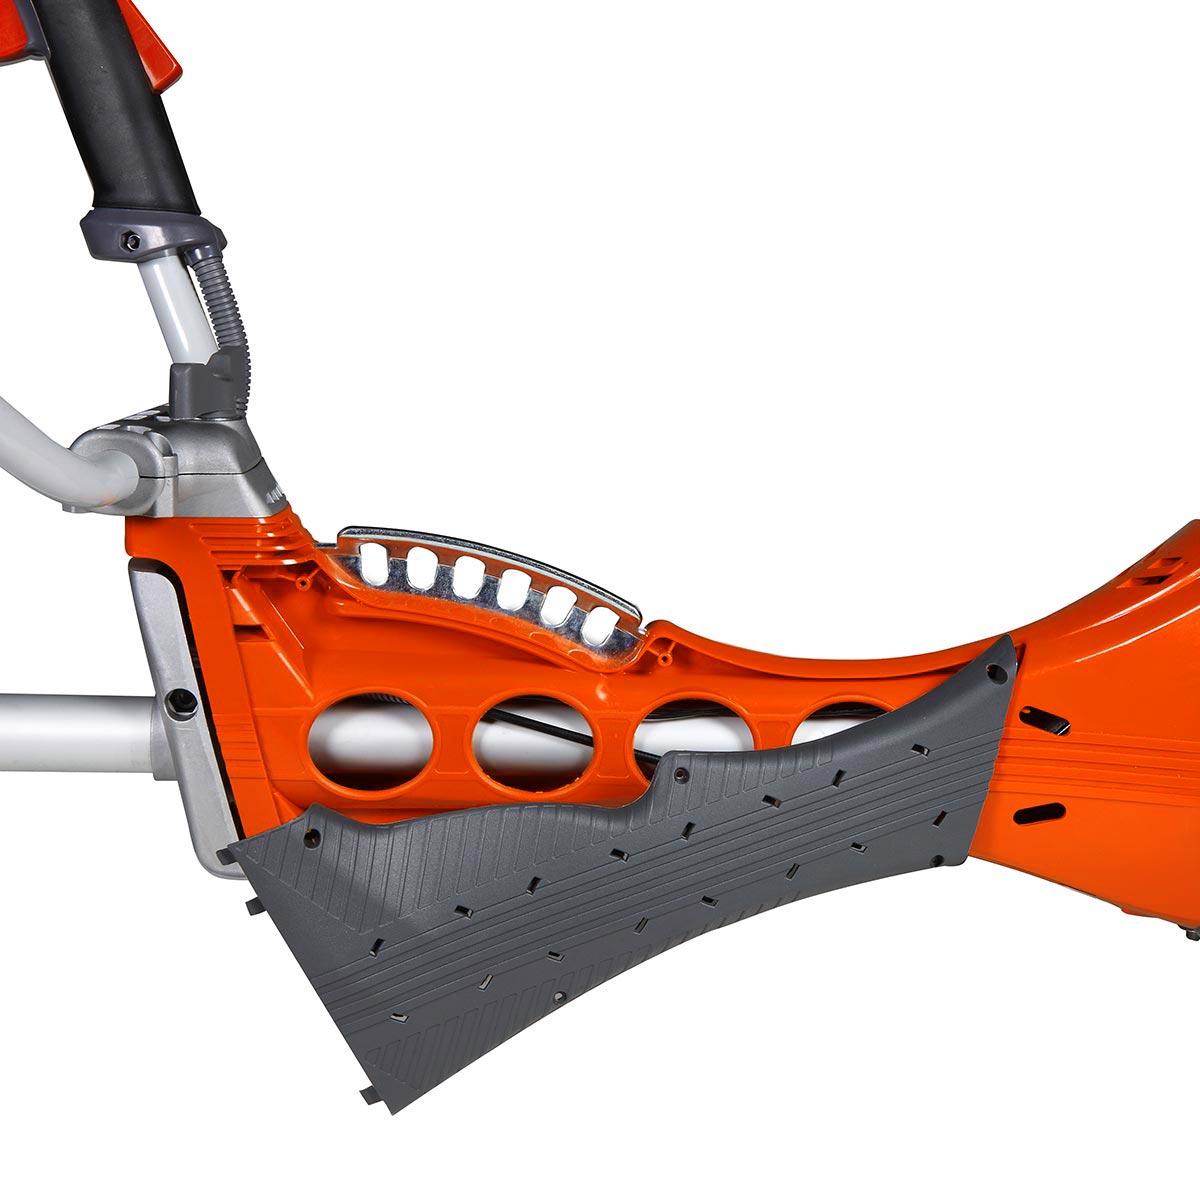 Oranžs Oleo-Mac trimmeris, 550 MASTER modelis, rokturis